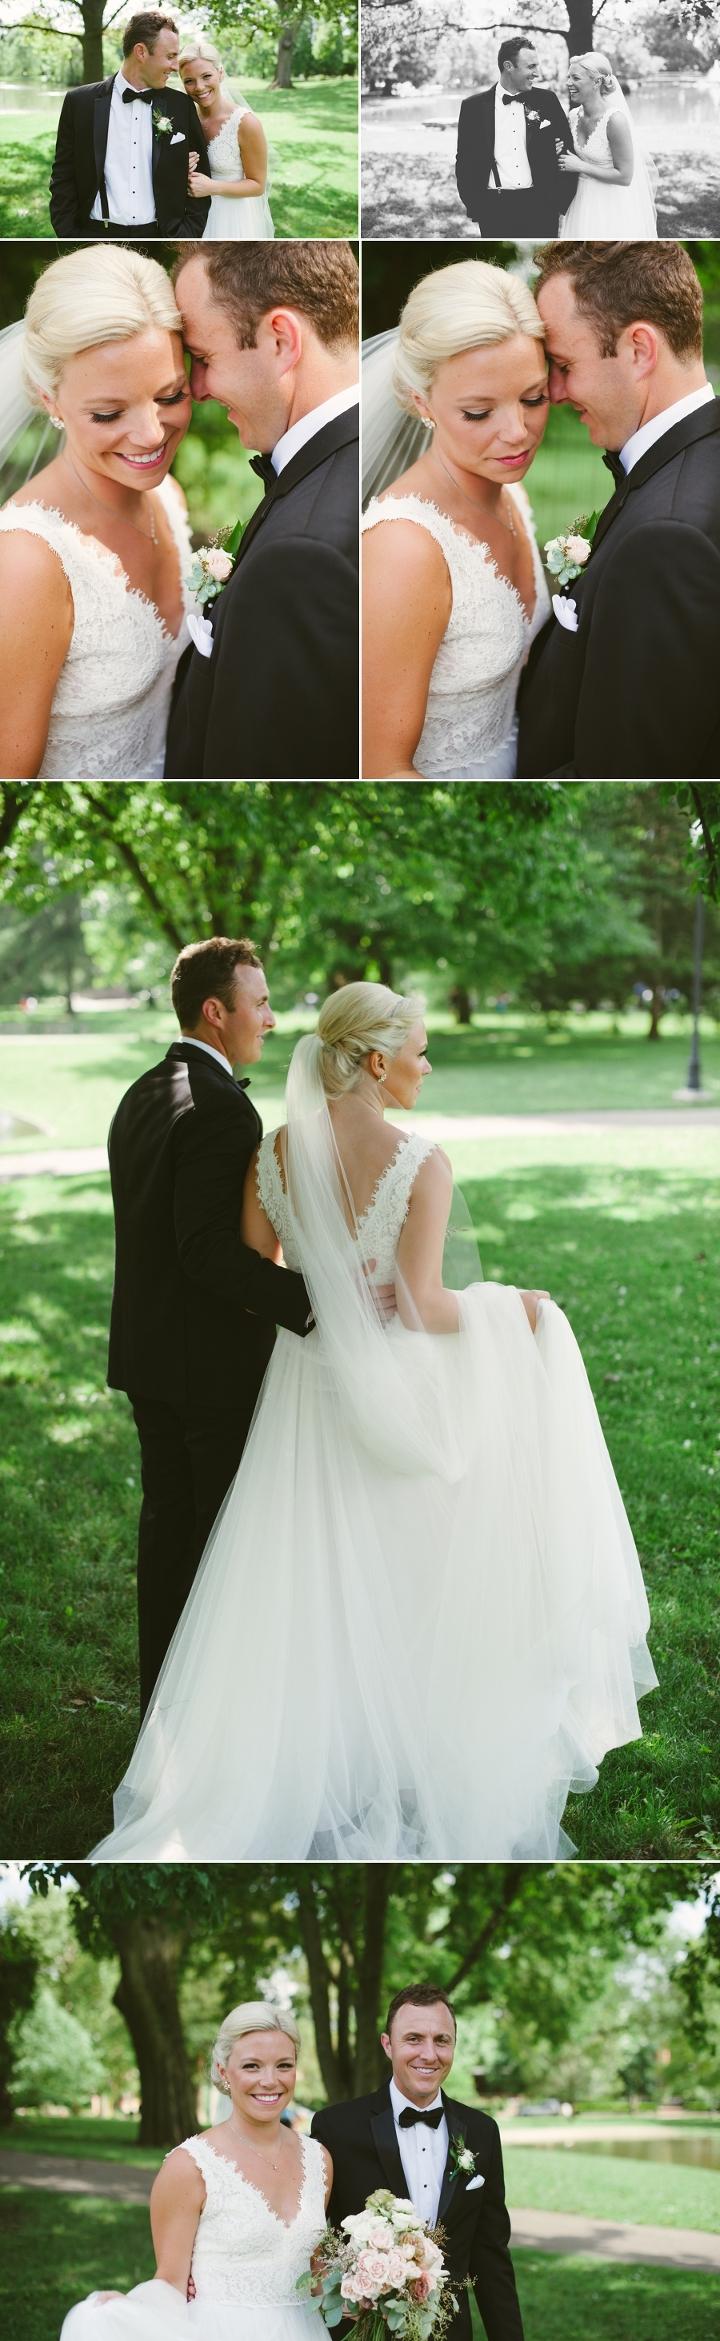 Megan and Dave 10